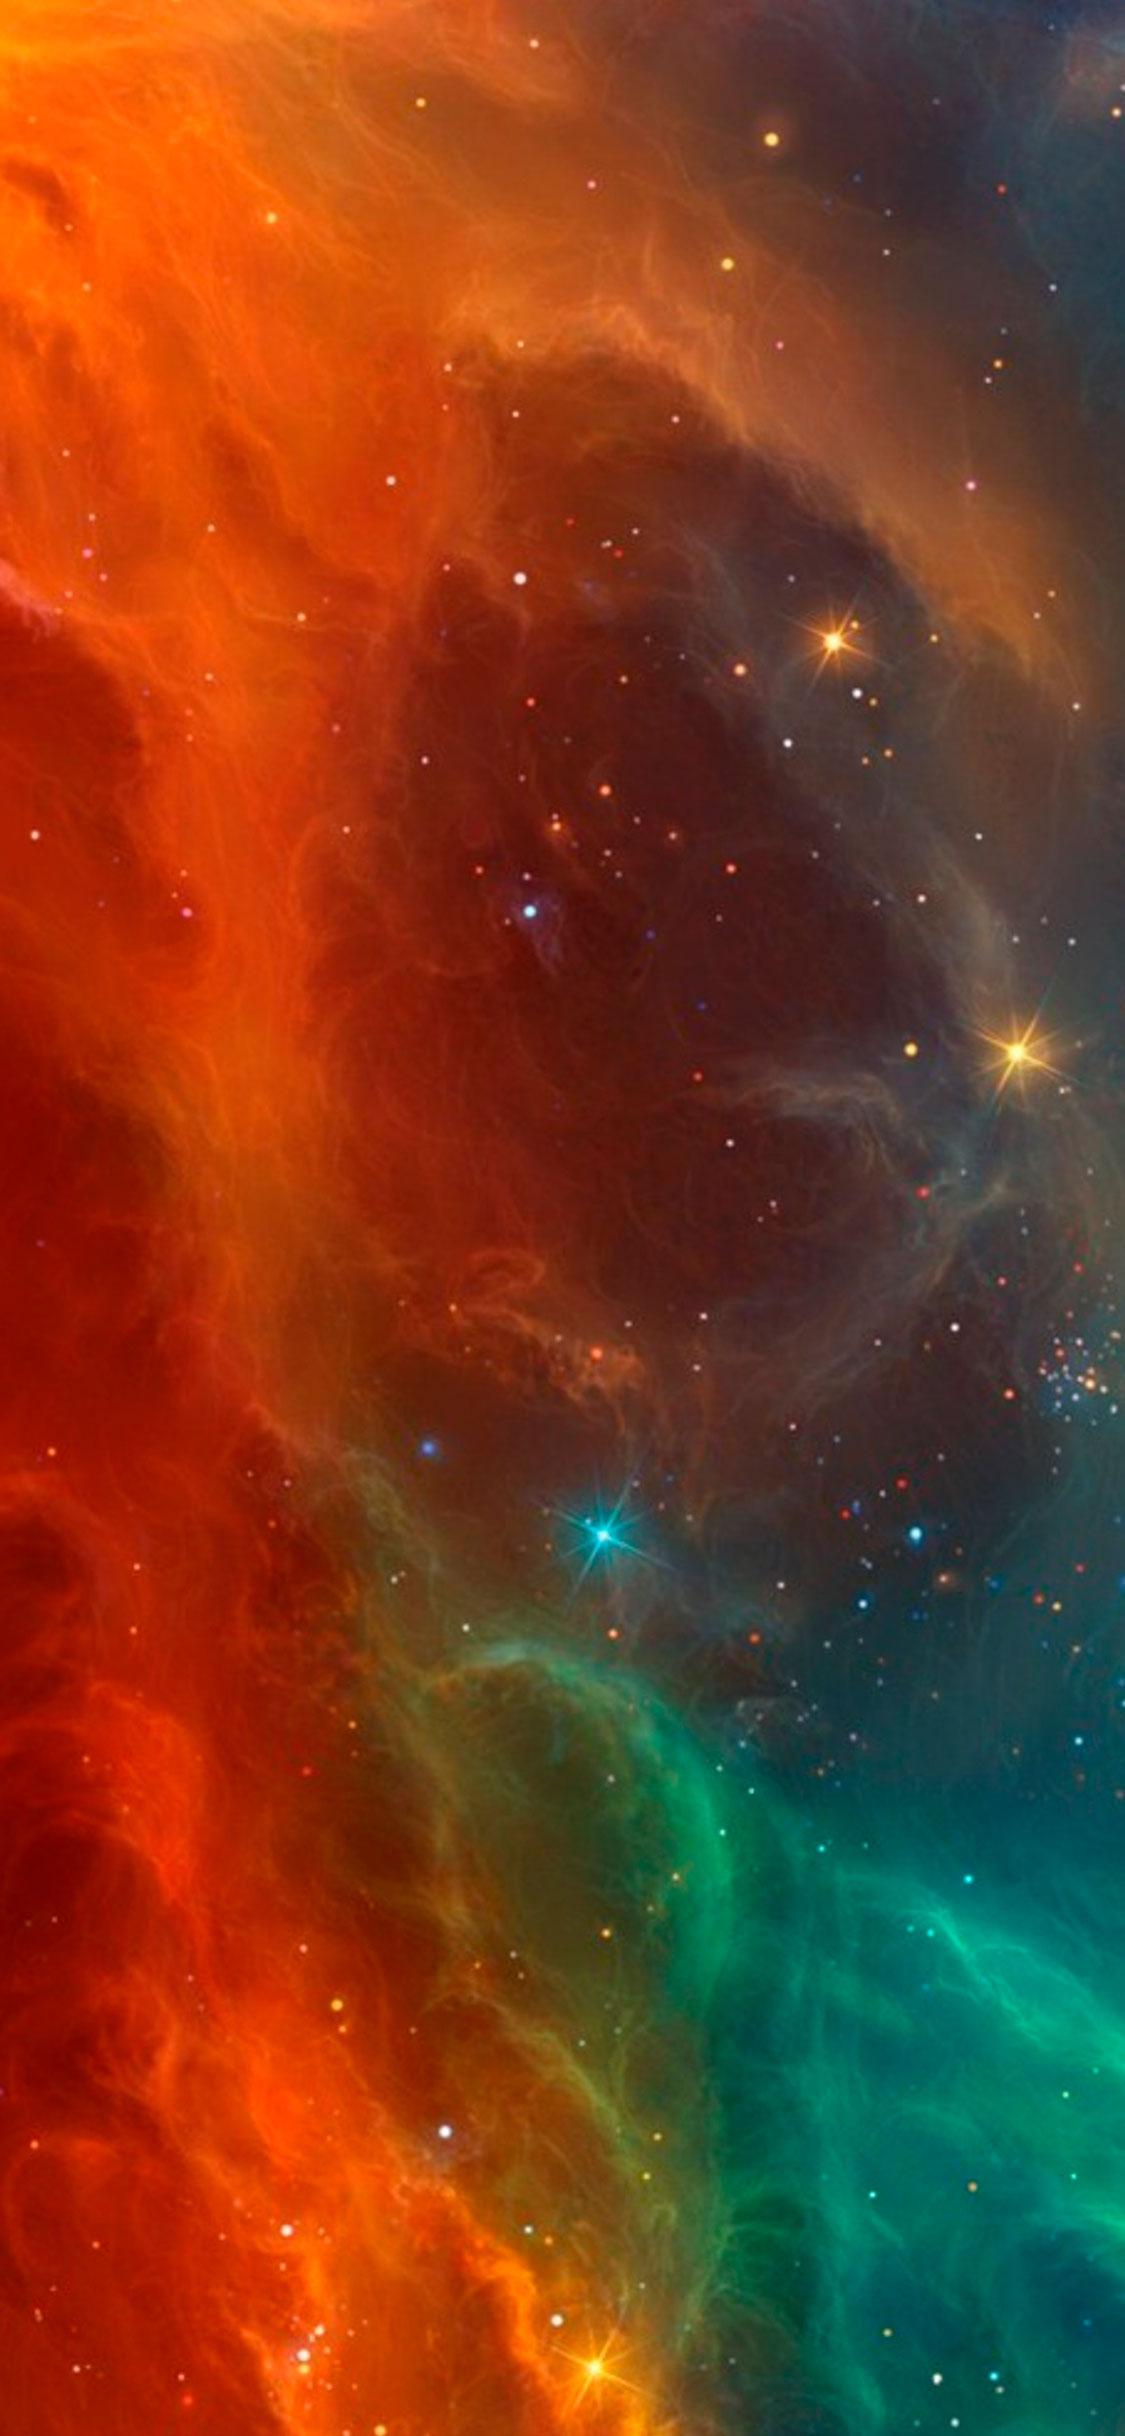 iPhone wallpaper galaxy1 Galaxy